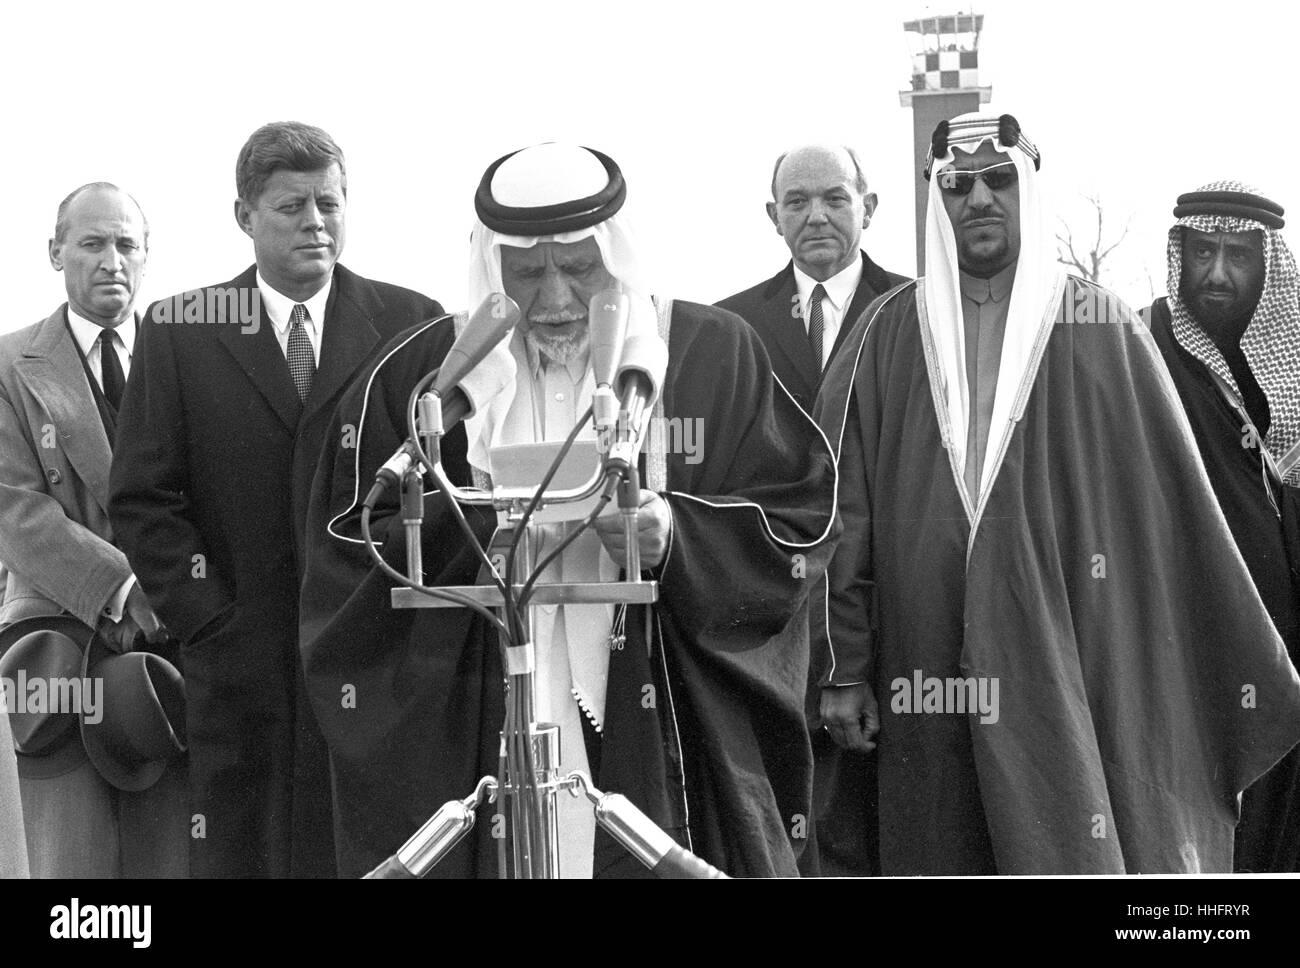 Founding King Abdulaziz Al-Saud and J. Kennedy 69